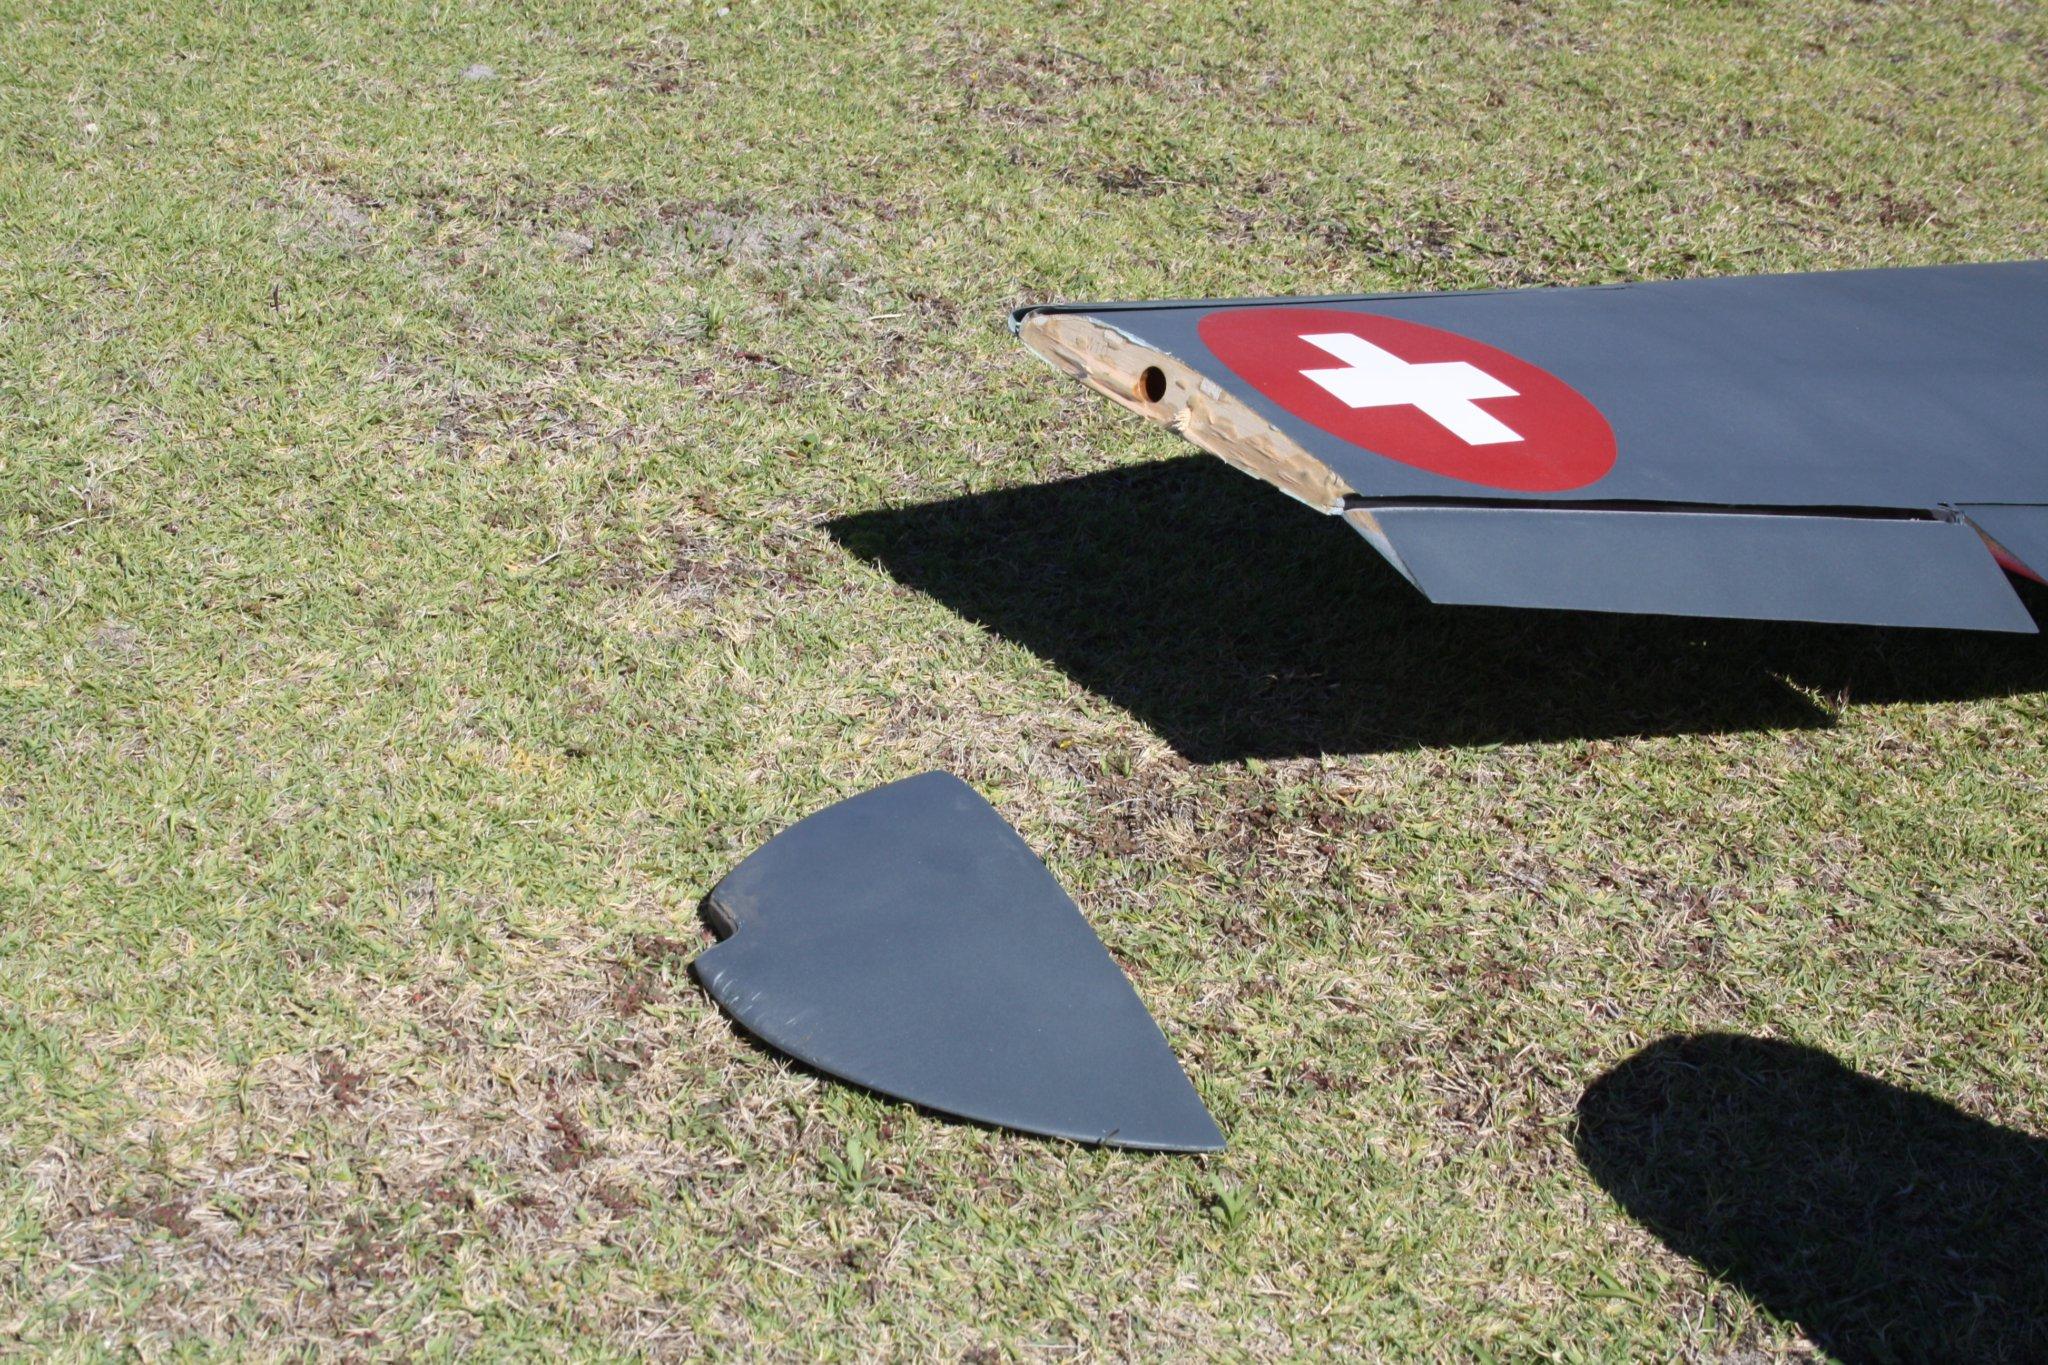 Click image for larger version  Name:2015_01_11 04 Test flight damage.JPG Views:240 Size:826.9 KB ID:2062883